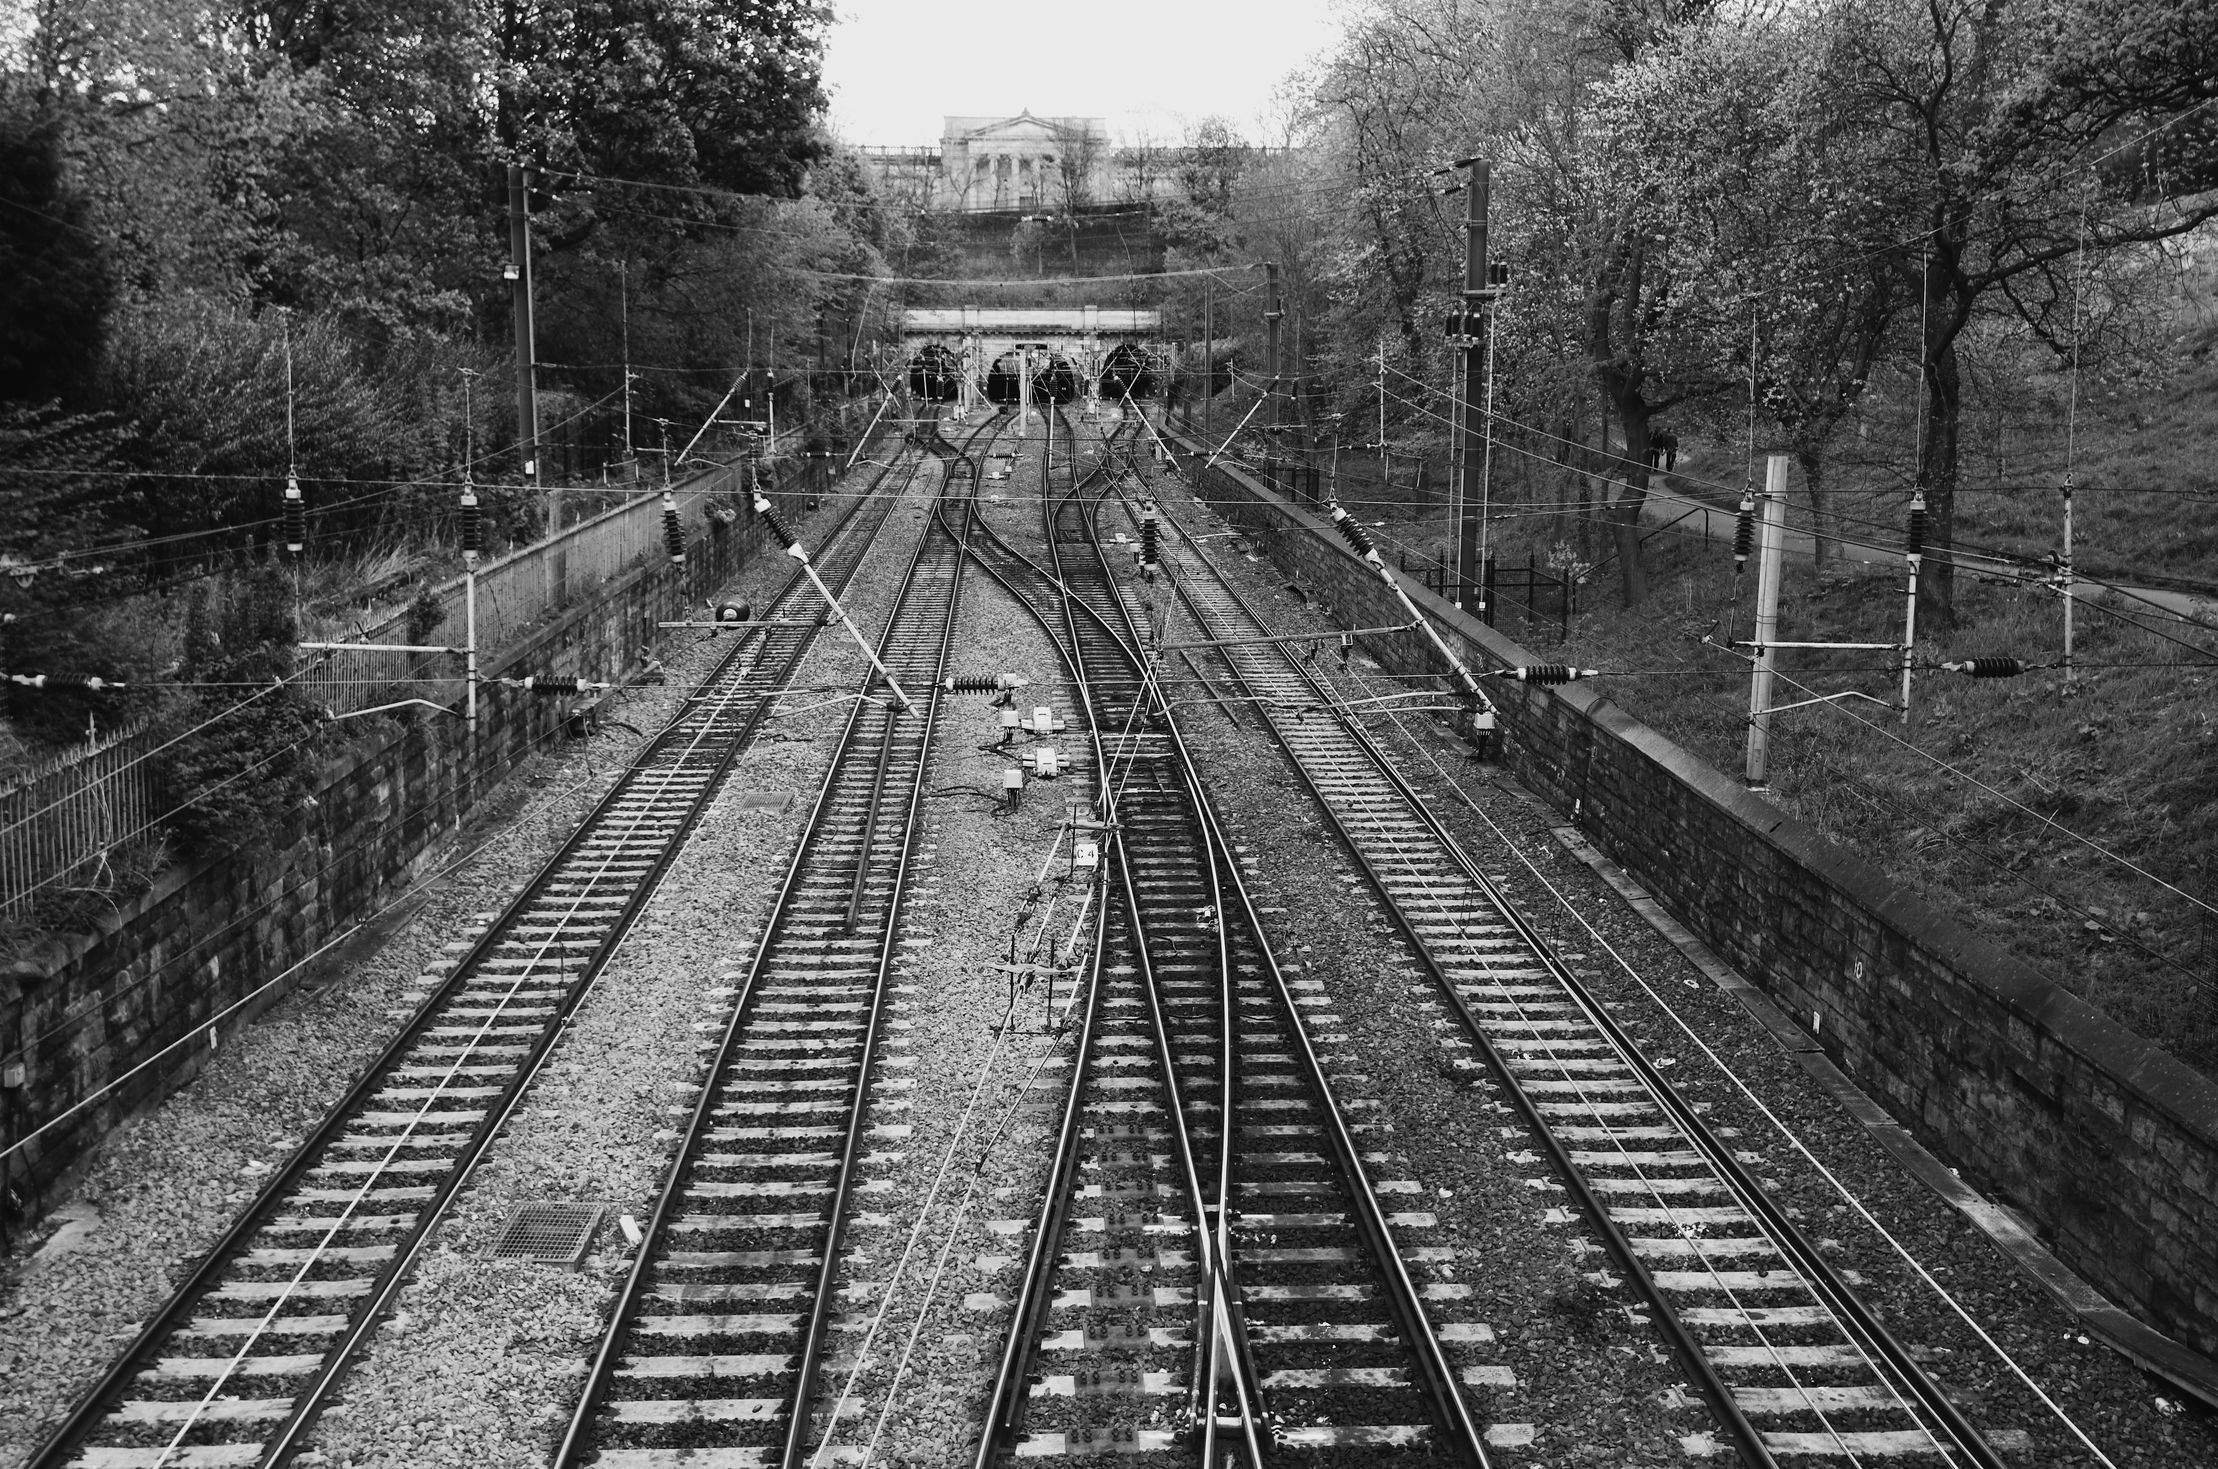 Footbridge Over the Train Line